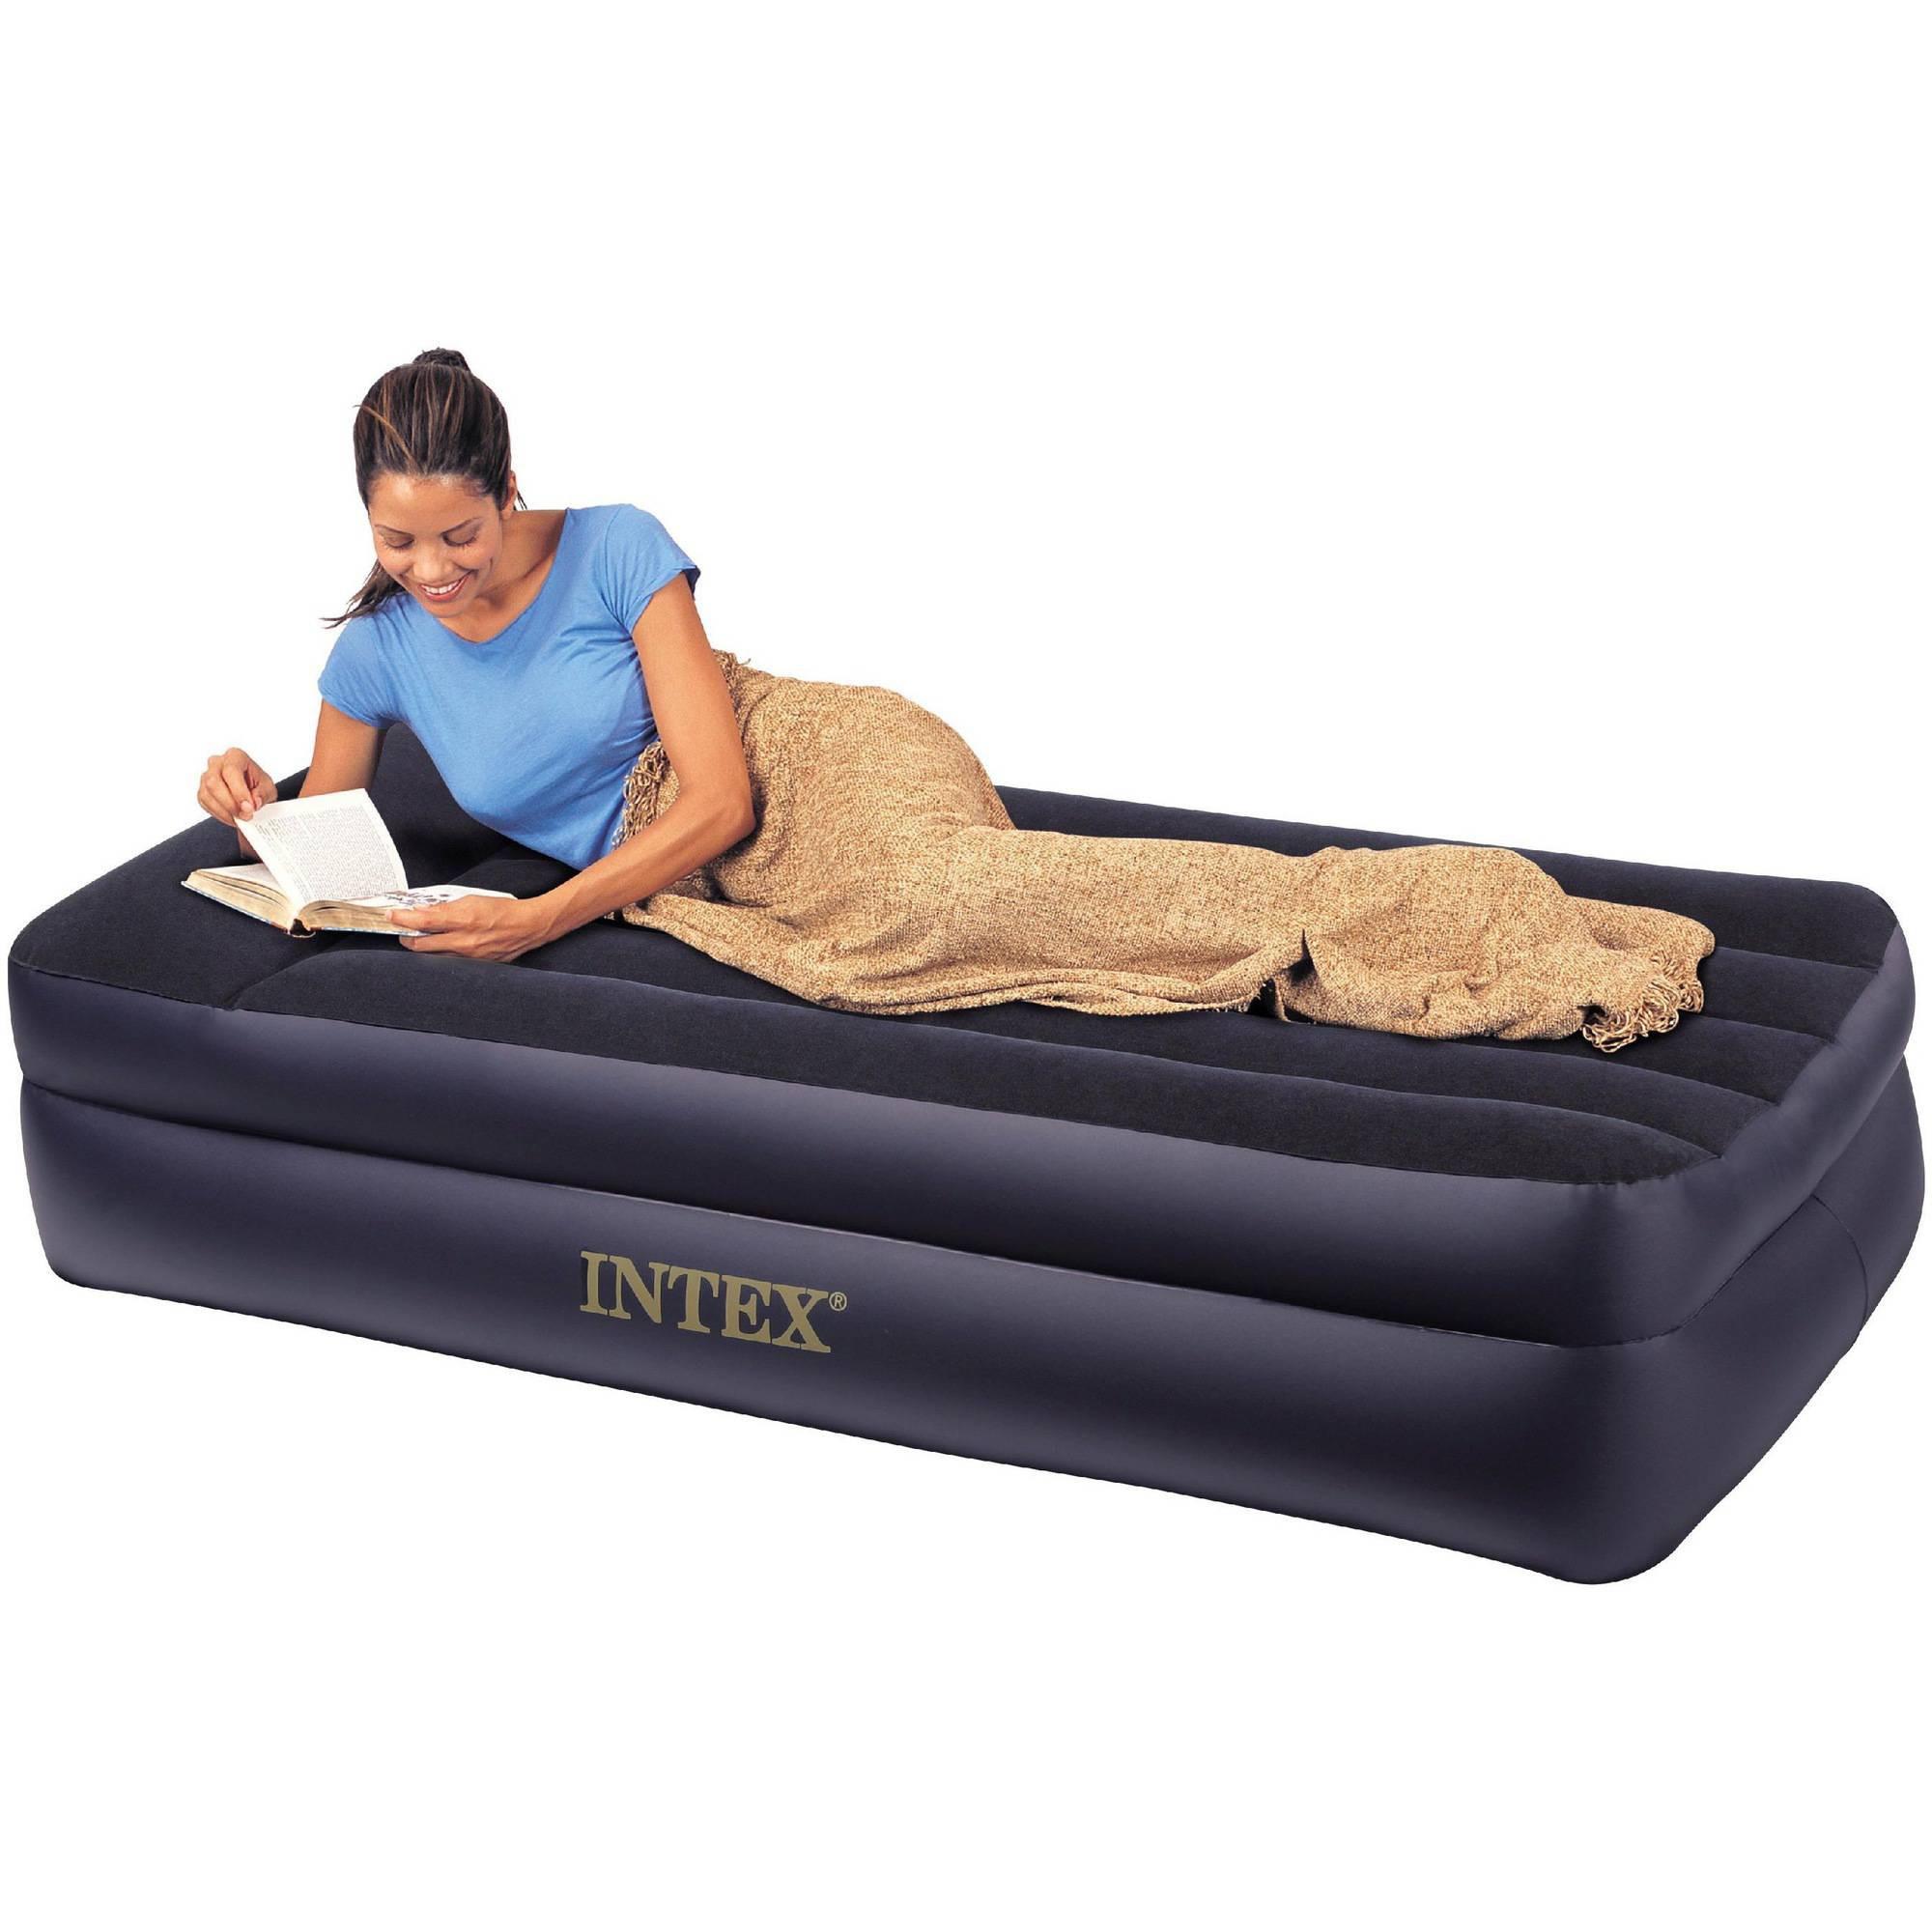 Intex Furniture - Ideas on Foter